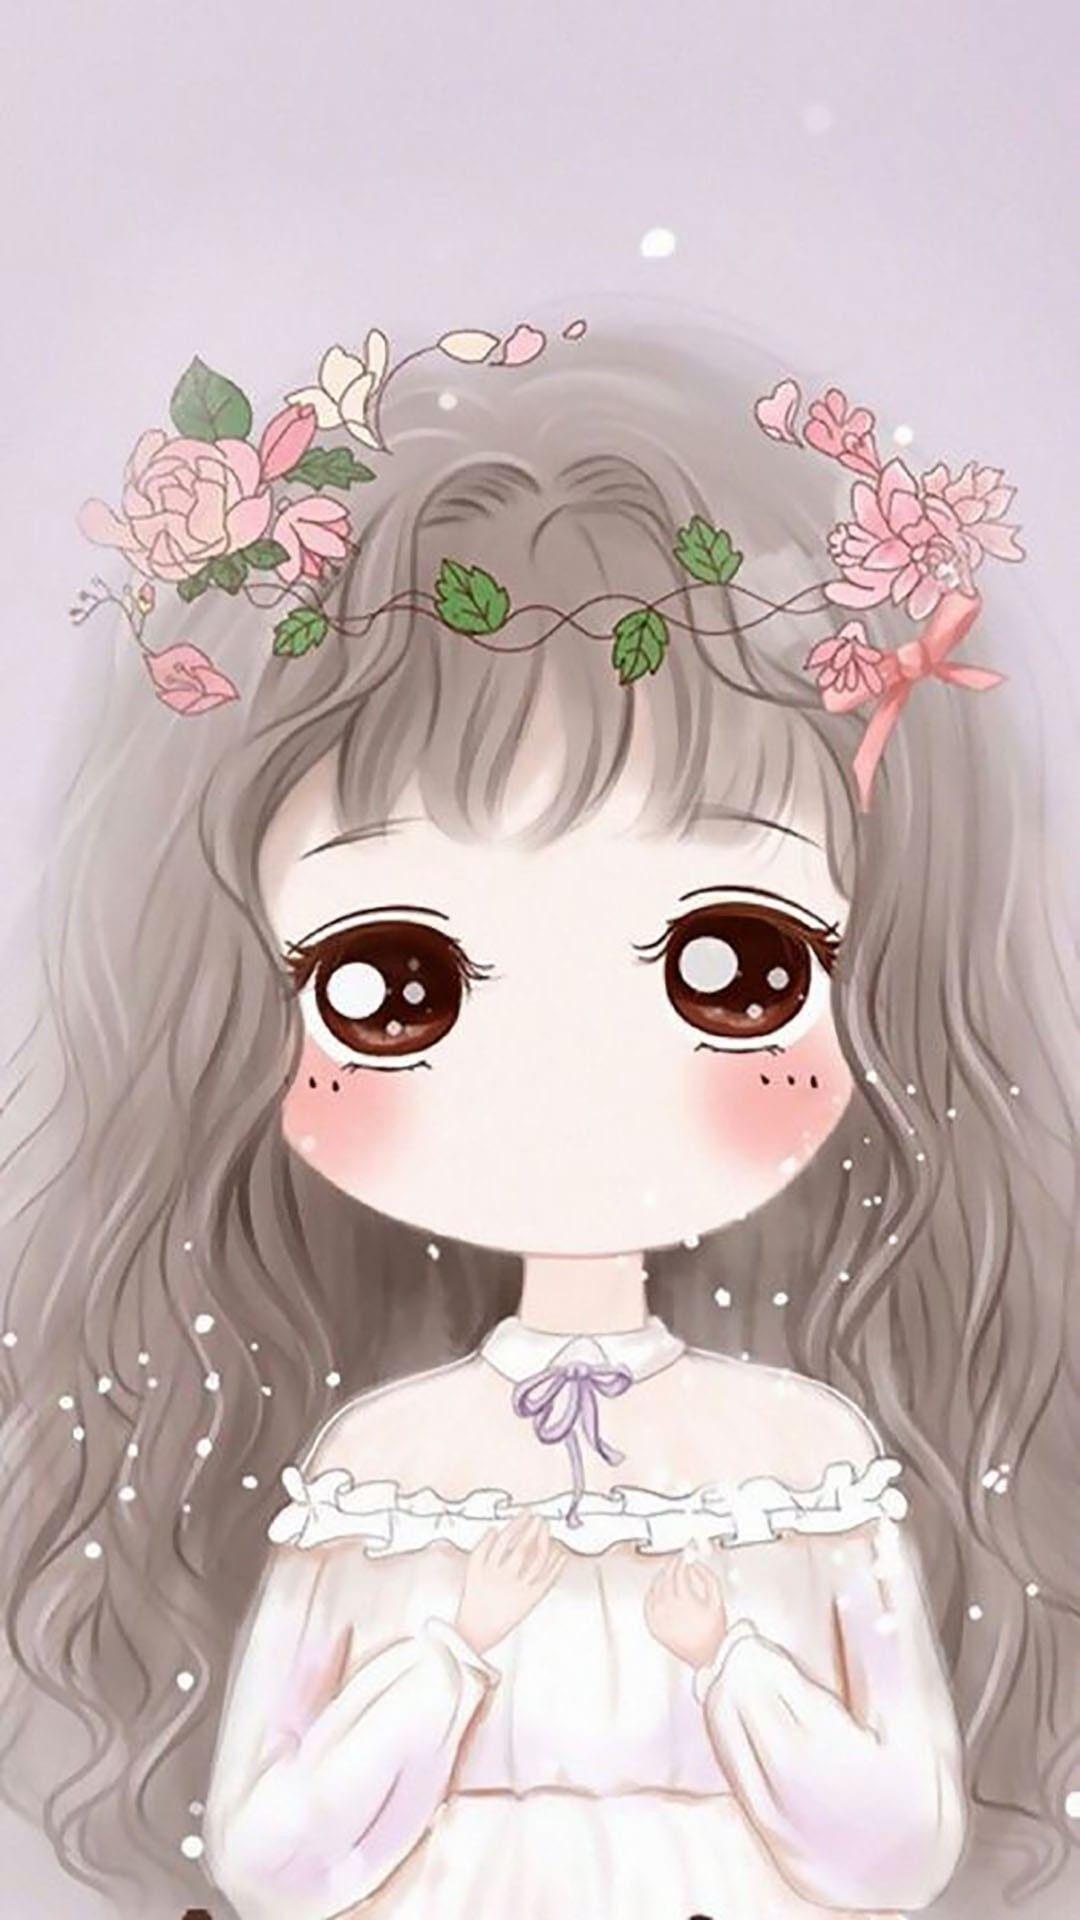 Pin Oleh Yasmin Nielson Di Pii Ilustrasi Karya Seni Fantasi Gadis Animasi